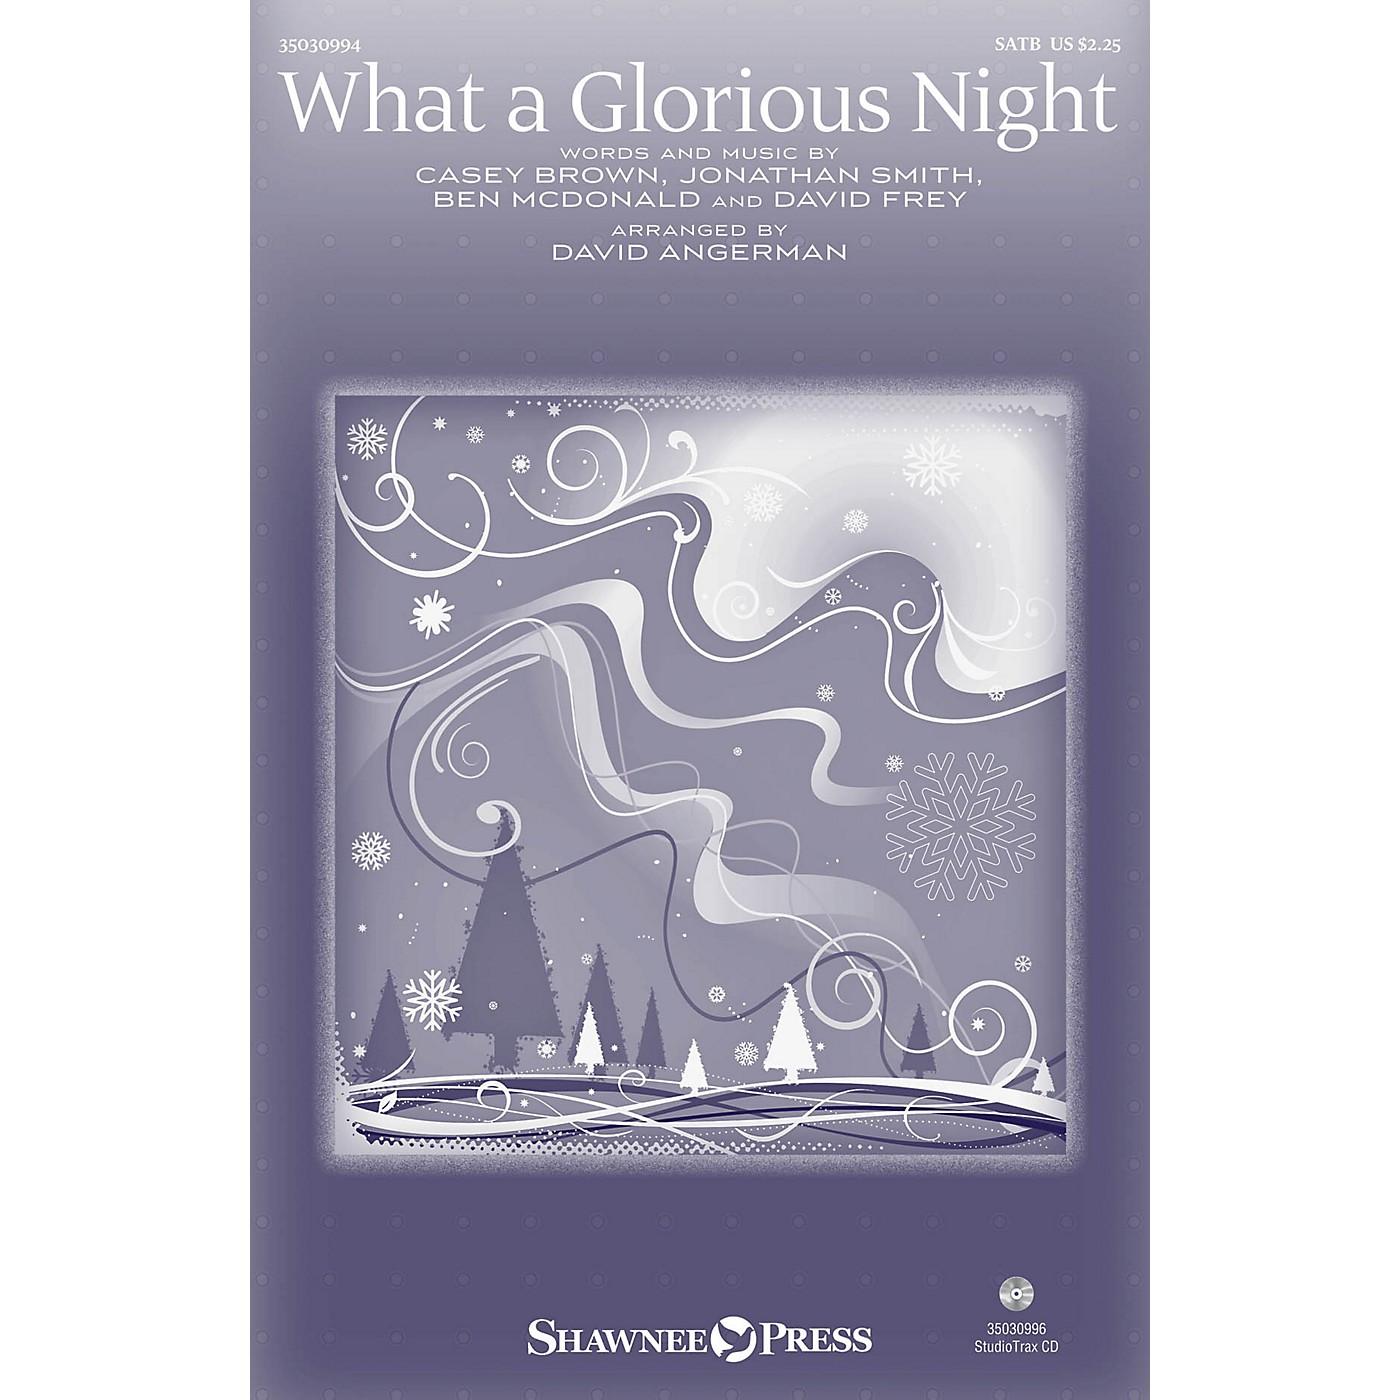 Shawnee Press What a Glorious Night Studiotrax CD by Sidewalk Prophets Arranged by David Angerman thumbnail